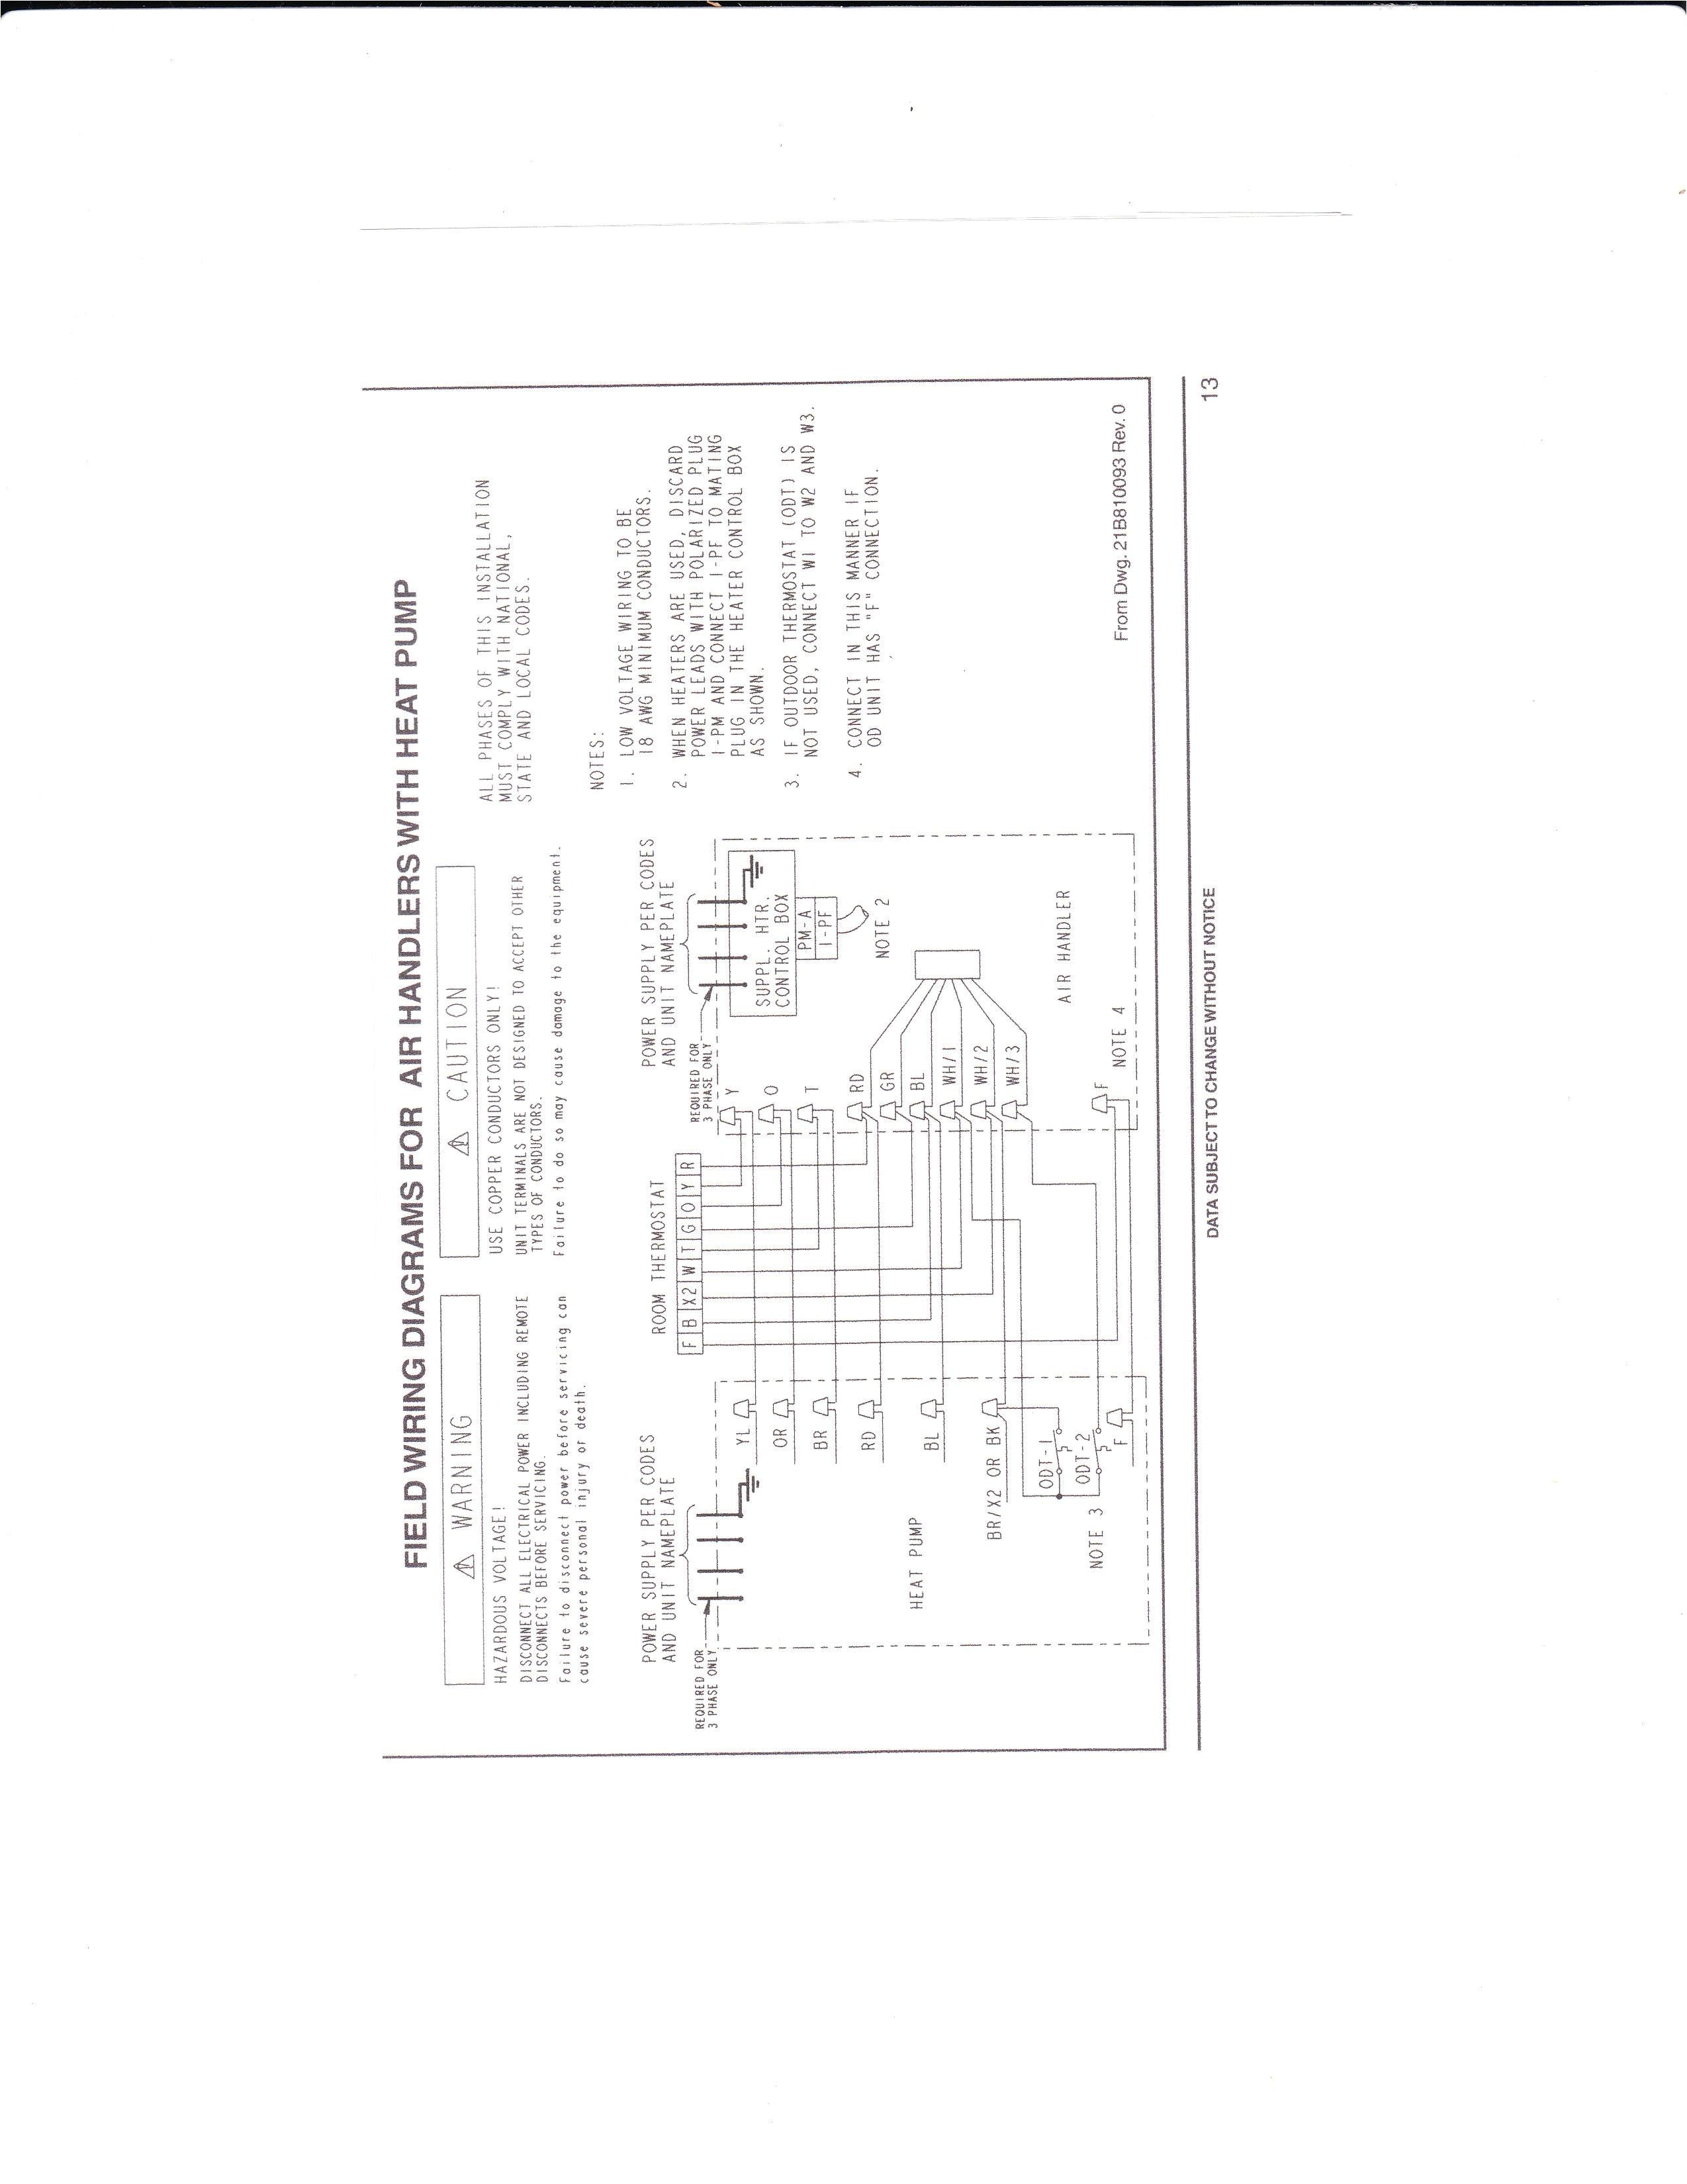 trane xr13 wiring diagram wiring diagramtrane wiring diagram new trane xl 1400 wiring diagram trane split